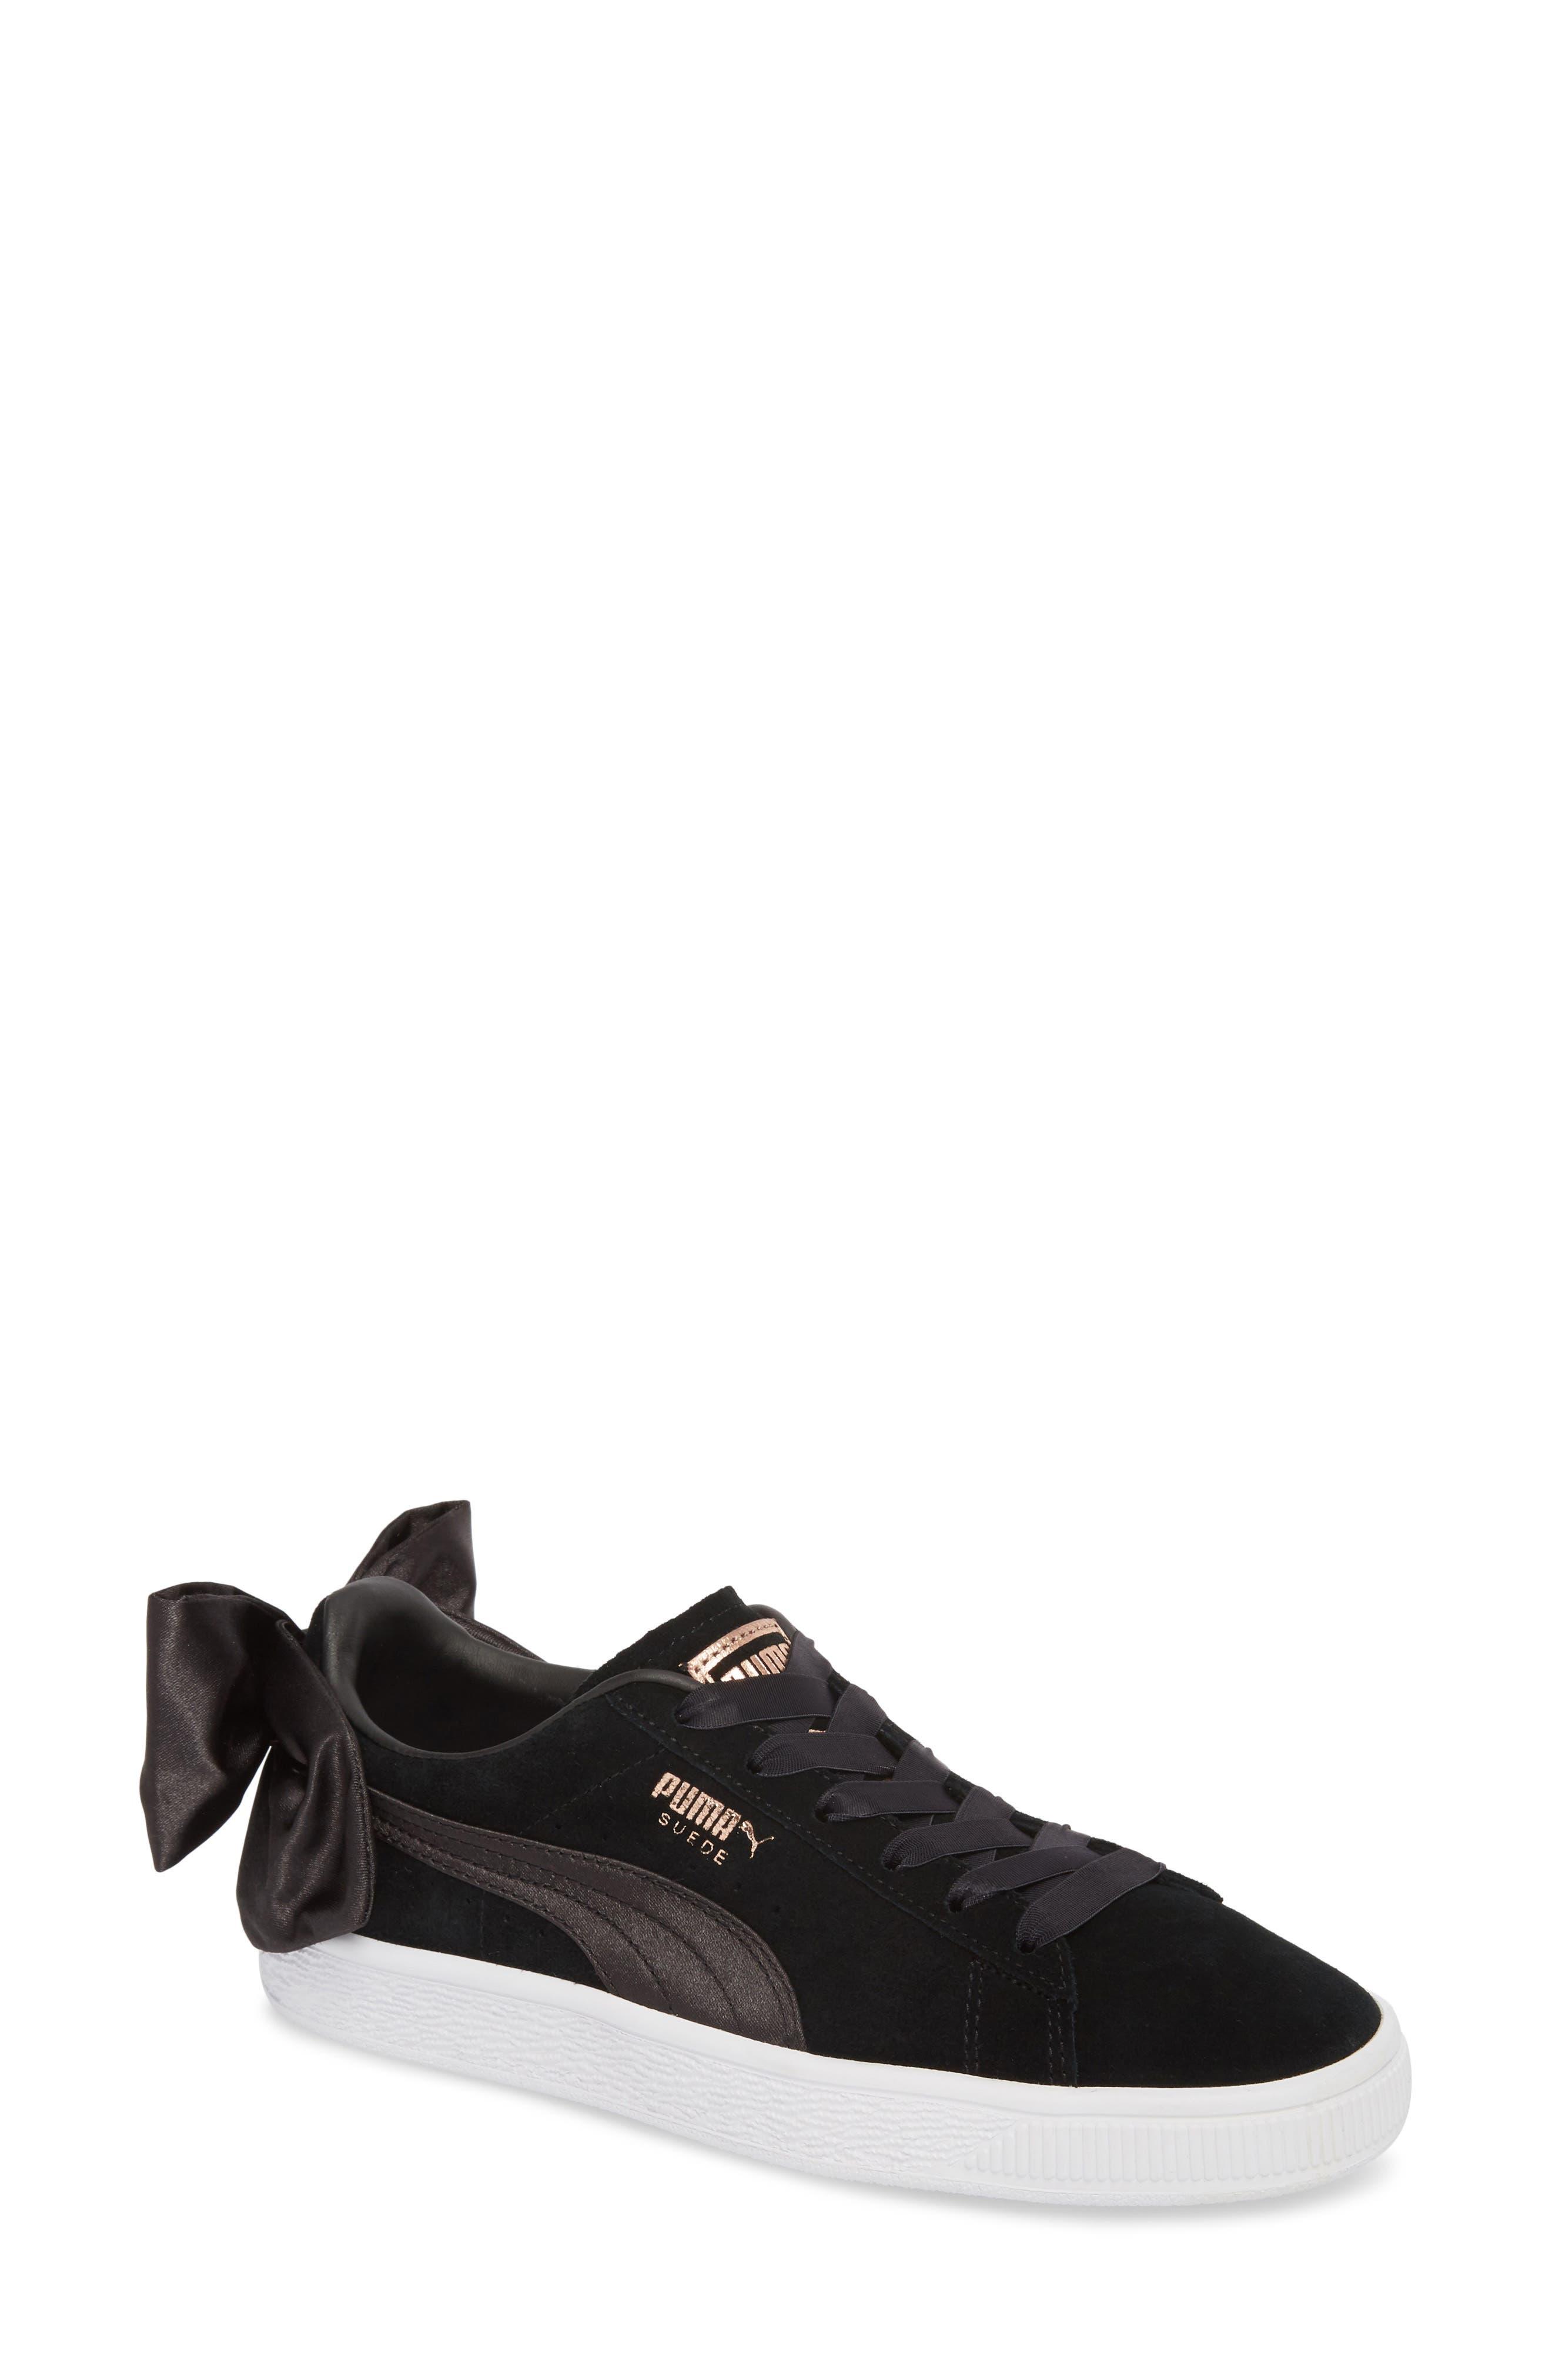 Bow Sneaker,                         Main,                         color, Black/ Black